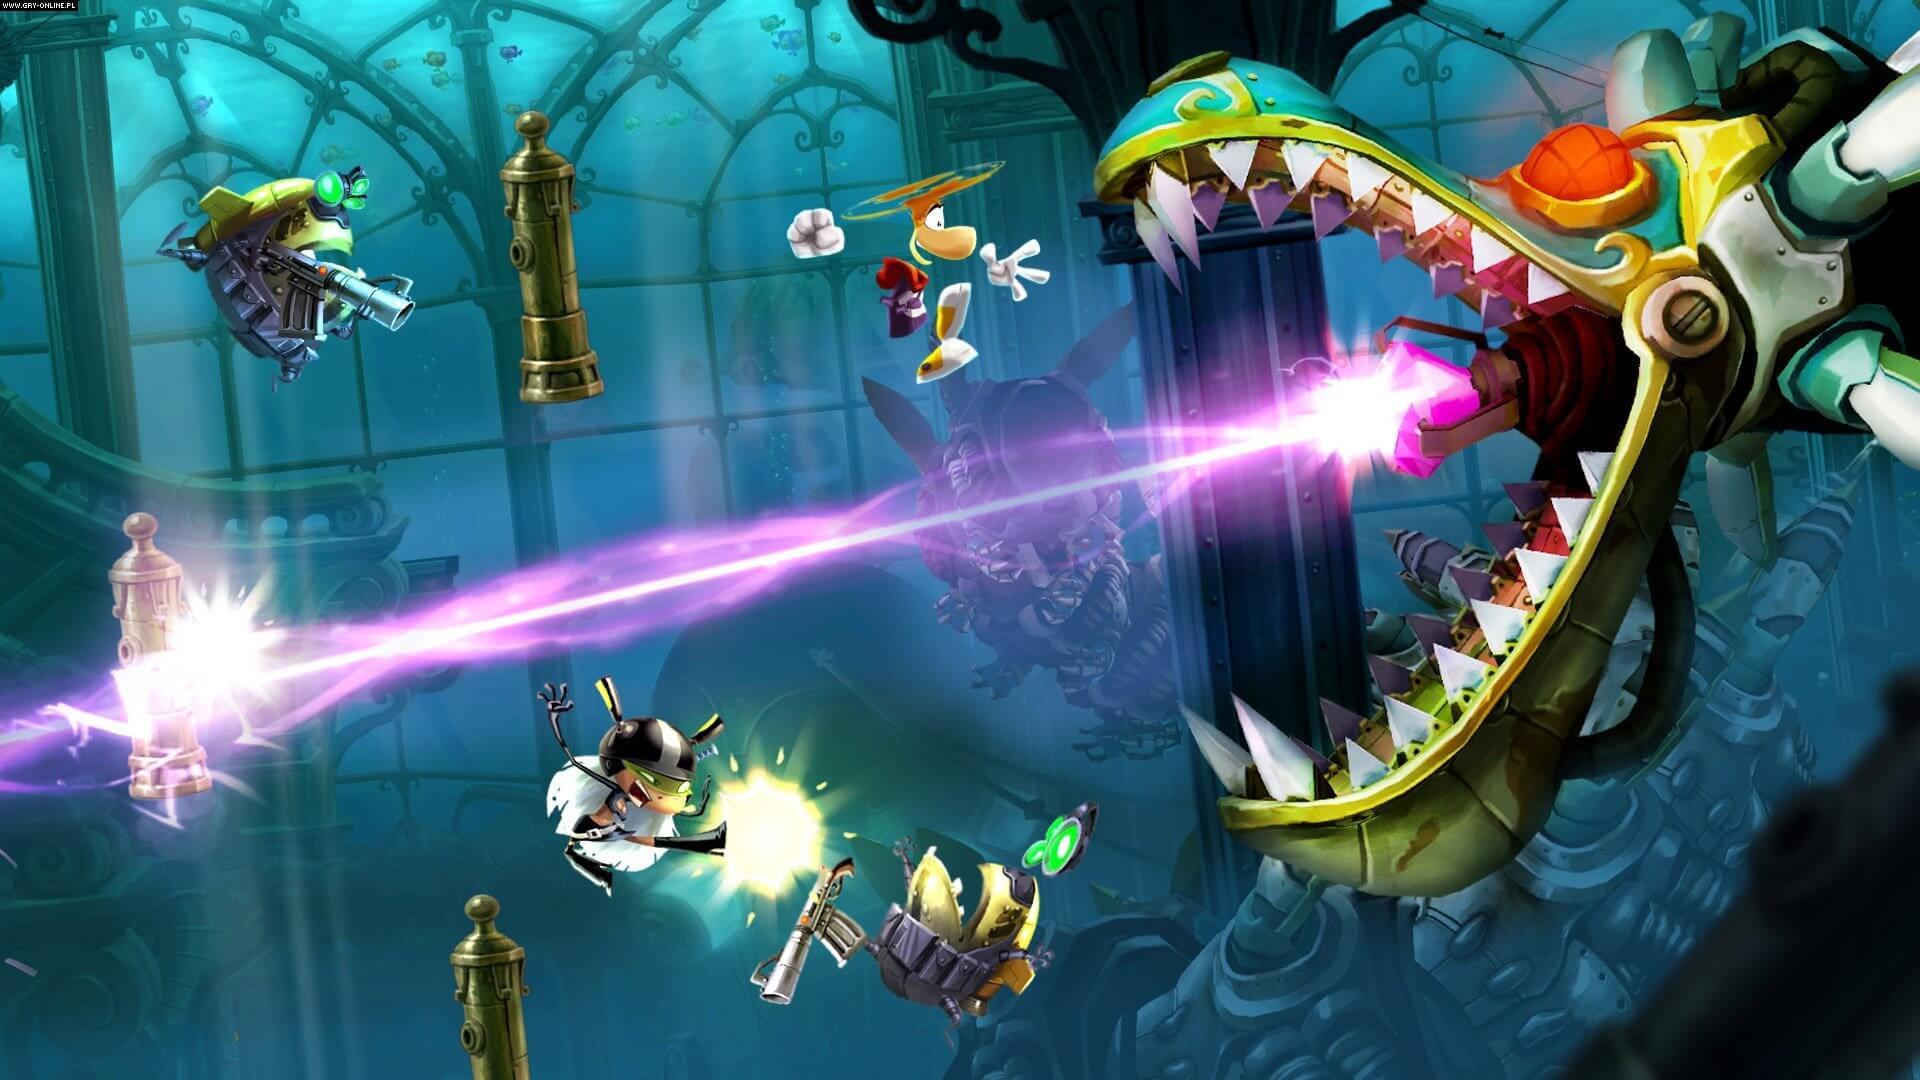 Rayman Legends Gameplay Screenshot 1